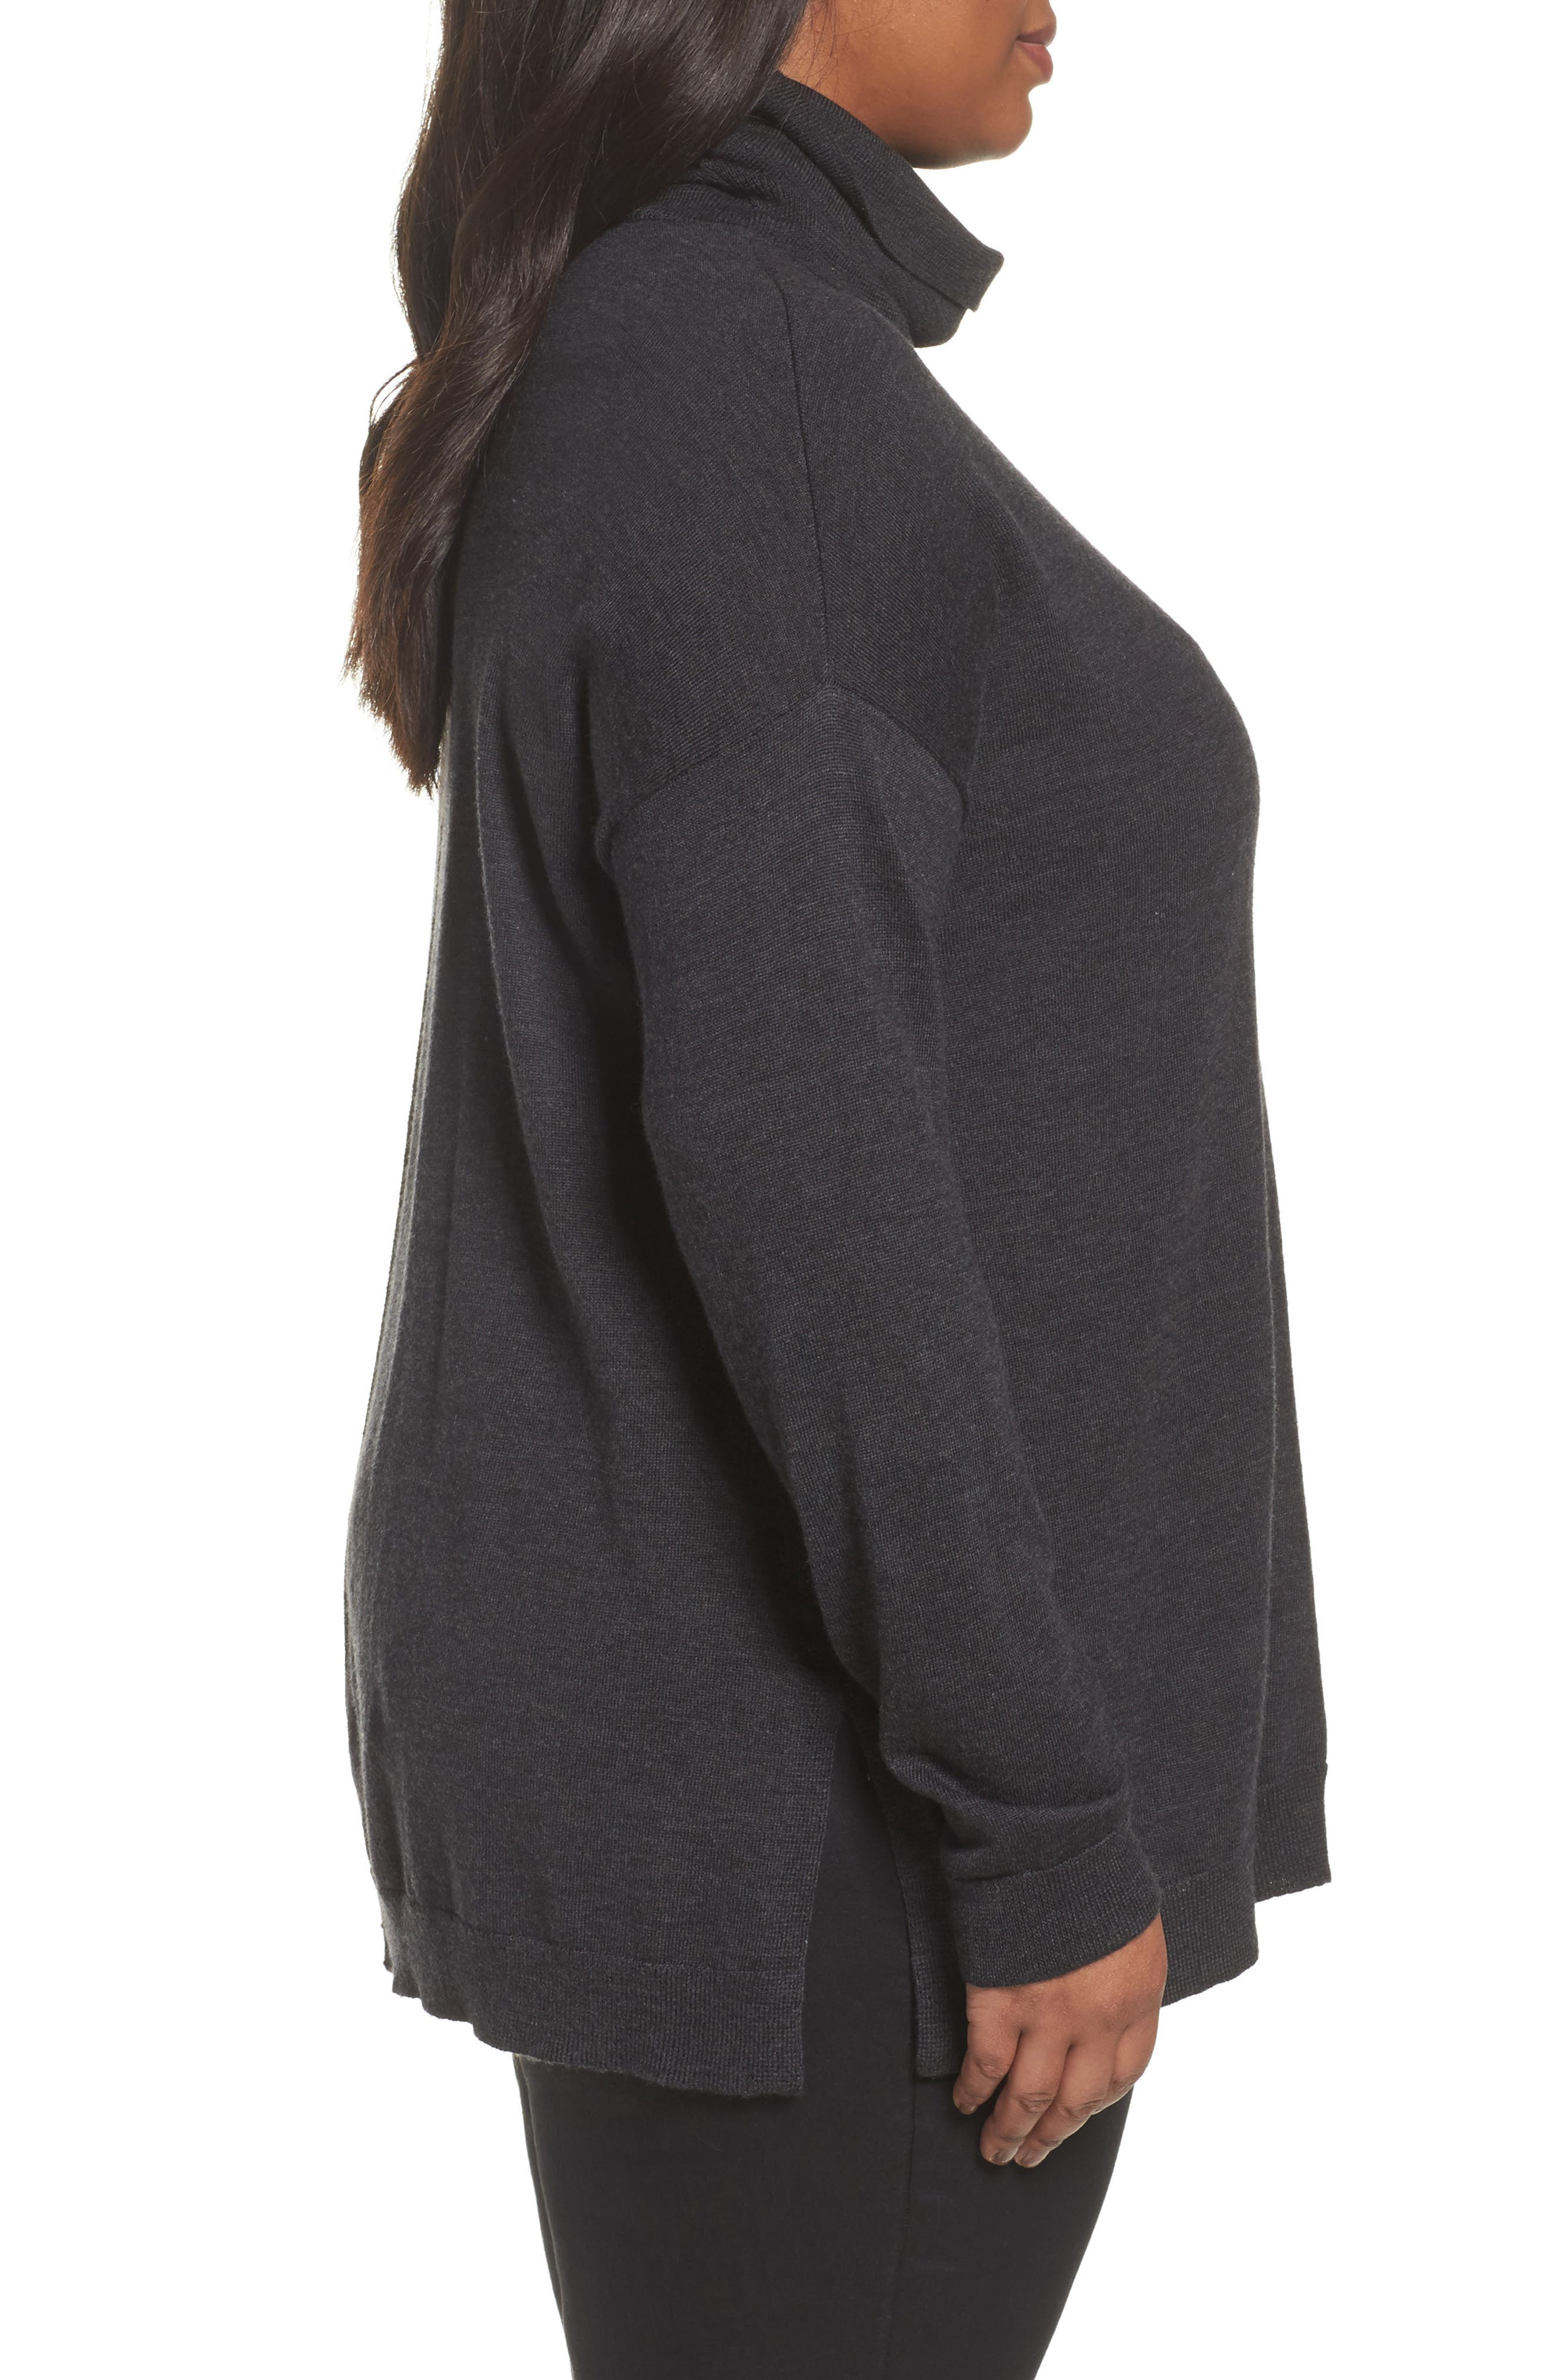 Alternate Image 3  - Eileen Fisher Merino Wool Turtleneck Sweater (Plus Size)